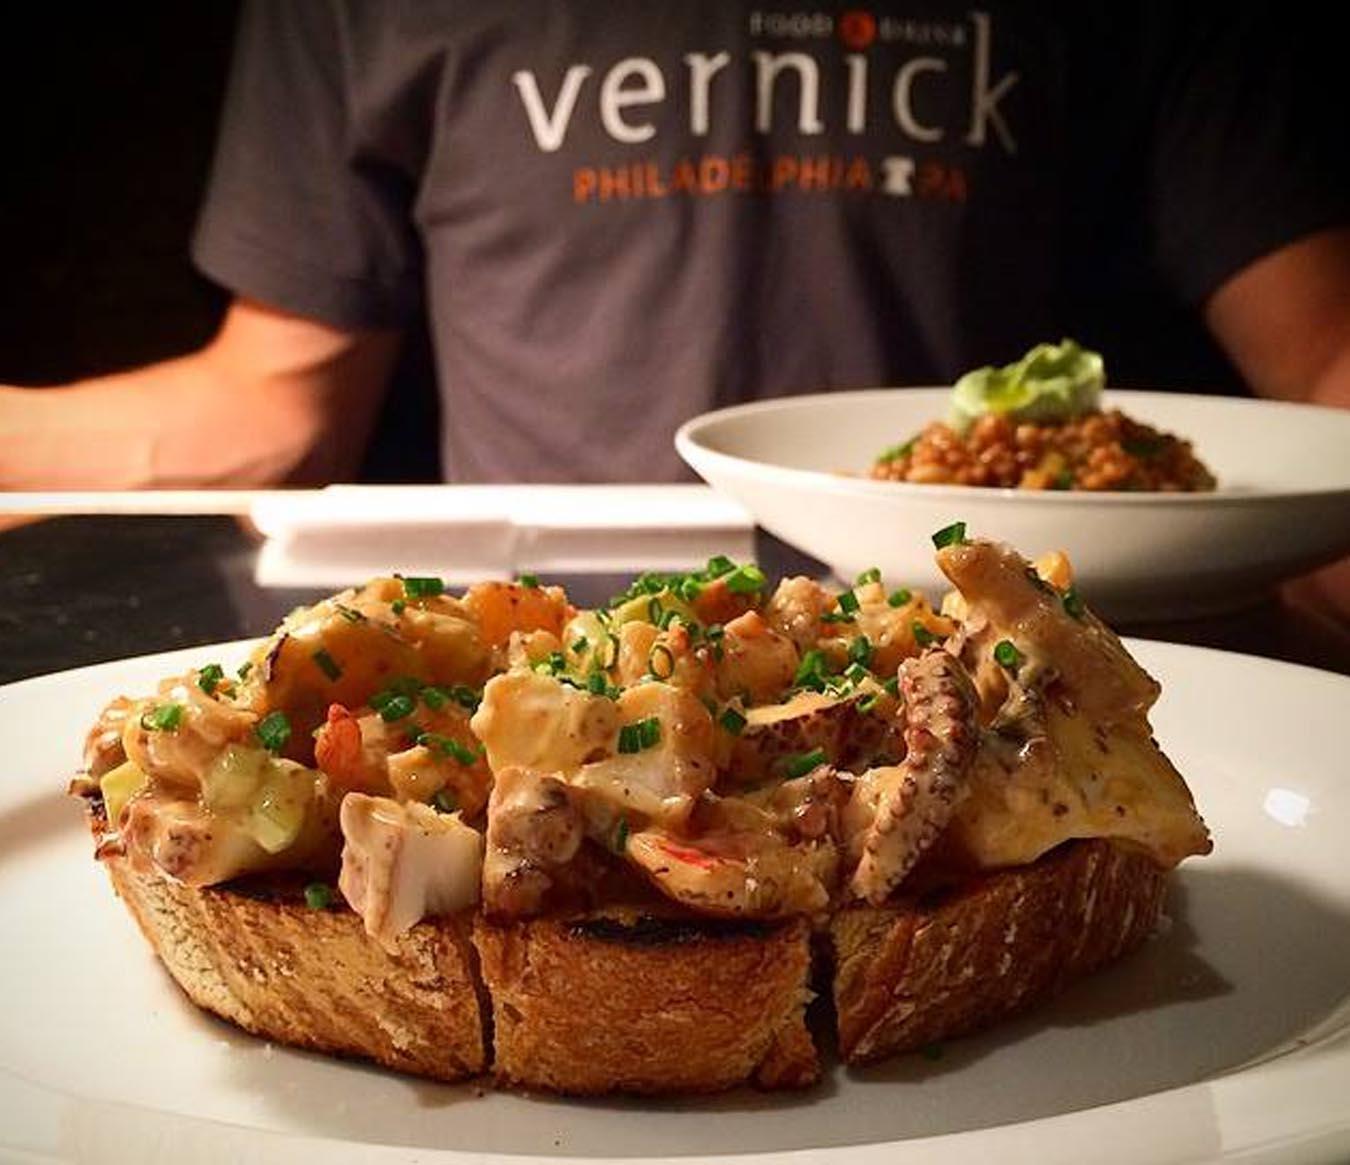 Where to Eat In Philadelphia - Vernick Food & Drink